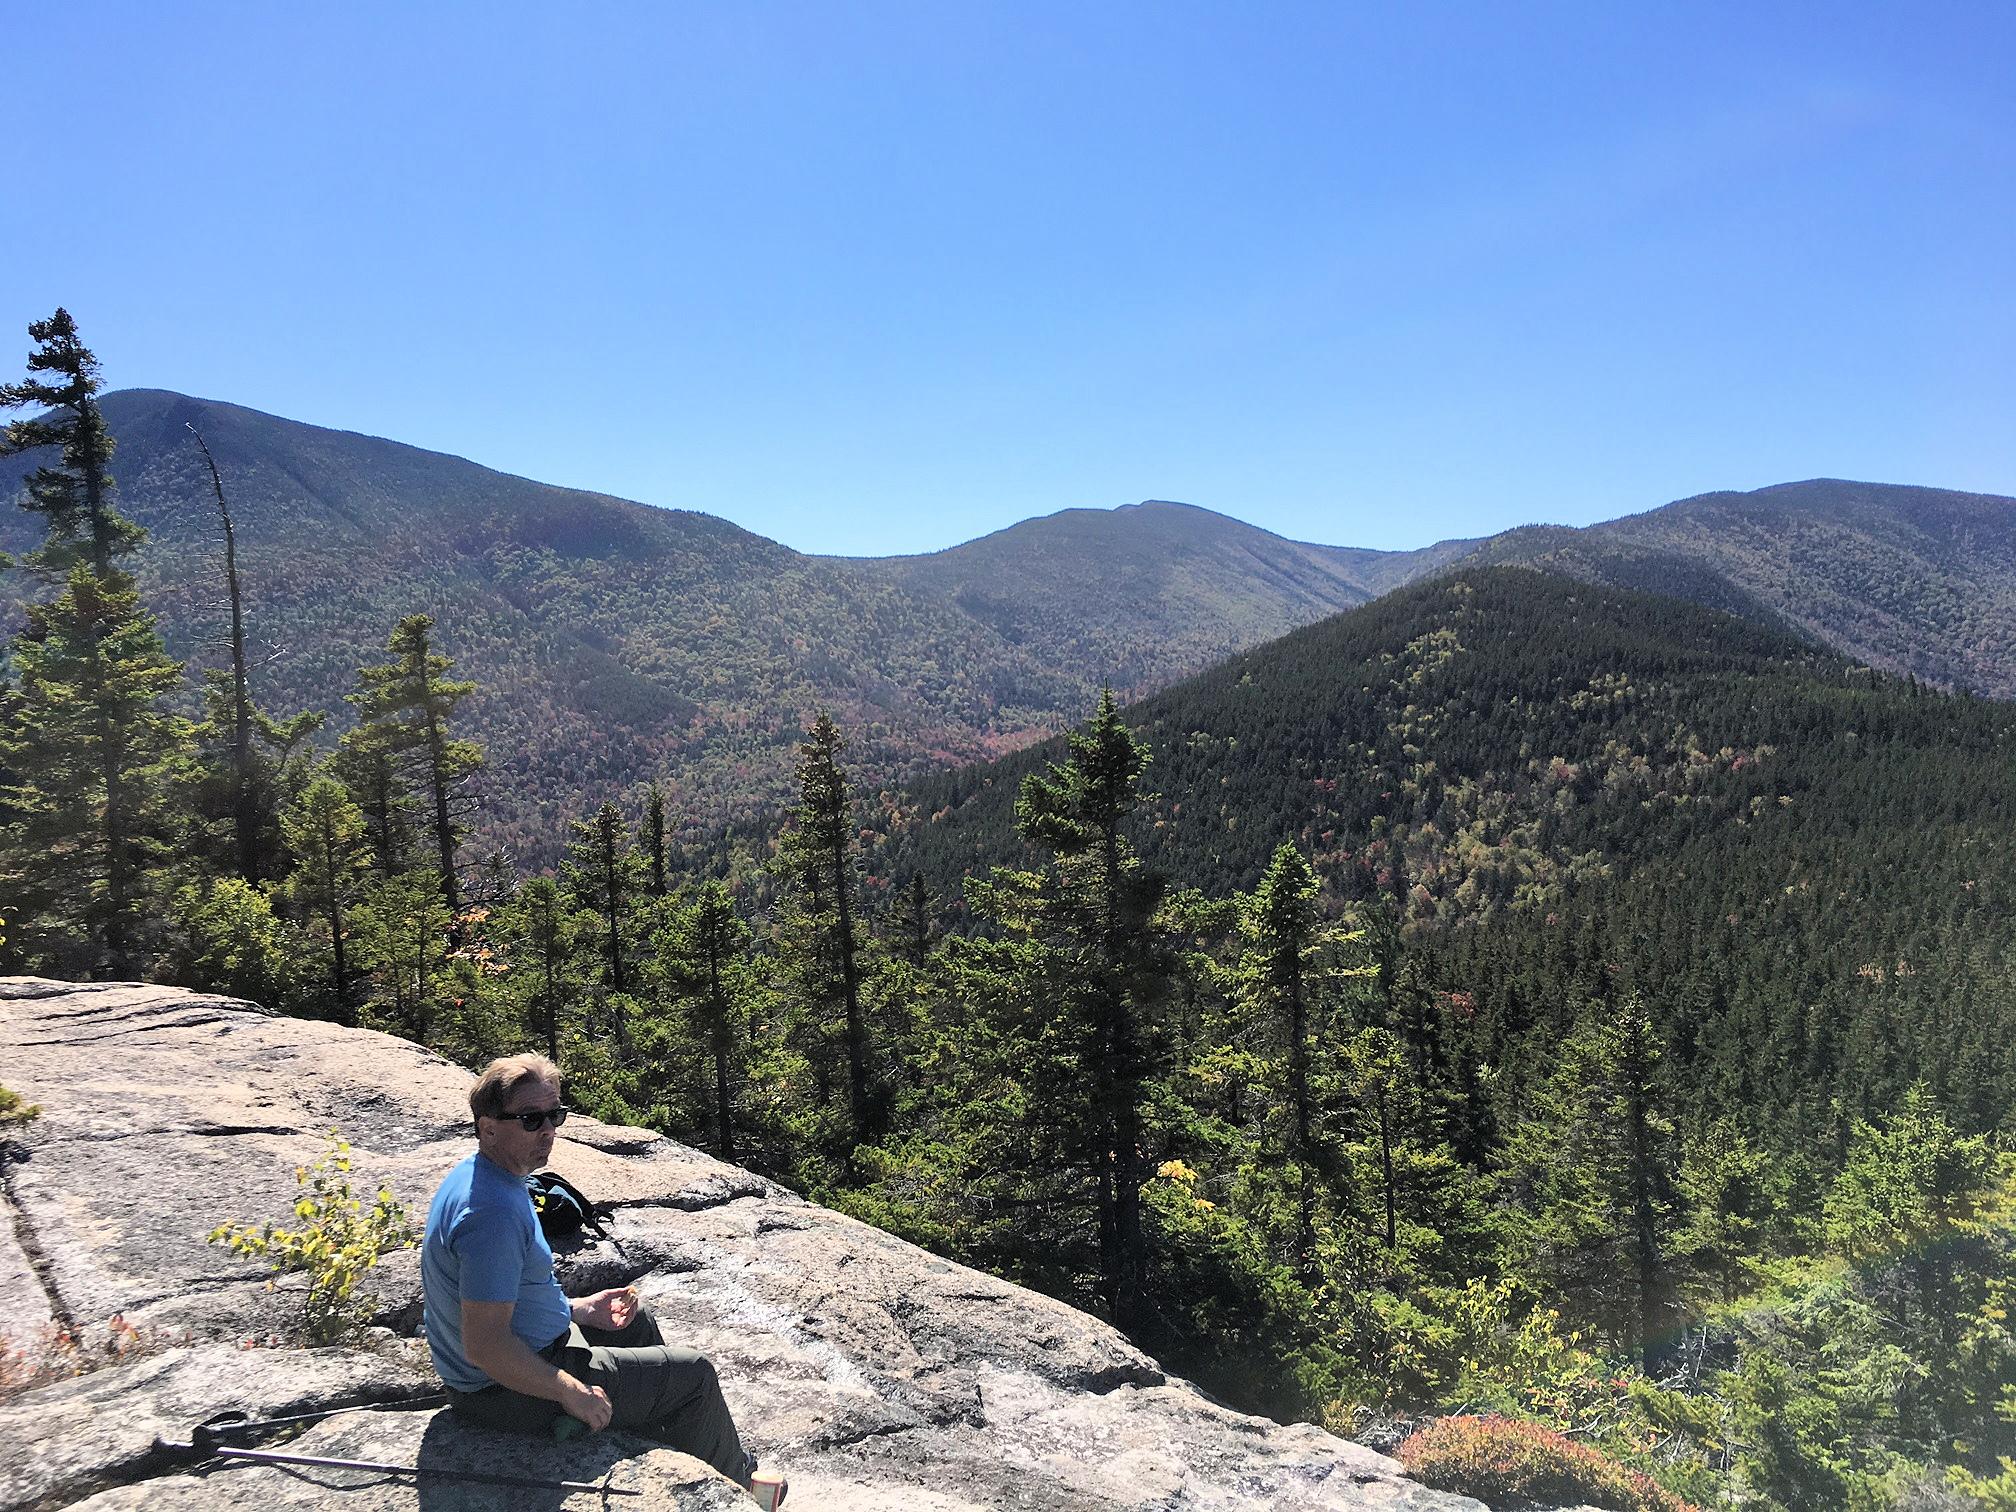 Lunchtime on Mt. Potash, looking south toward Mt. Passaconaway